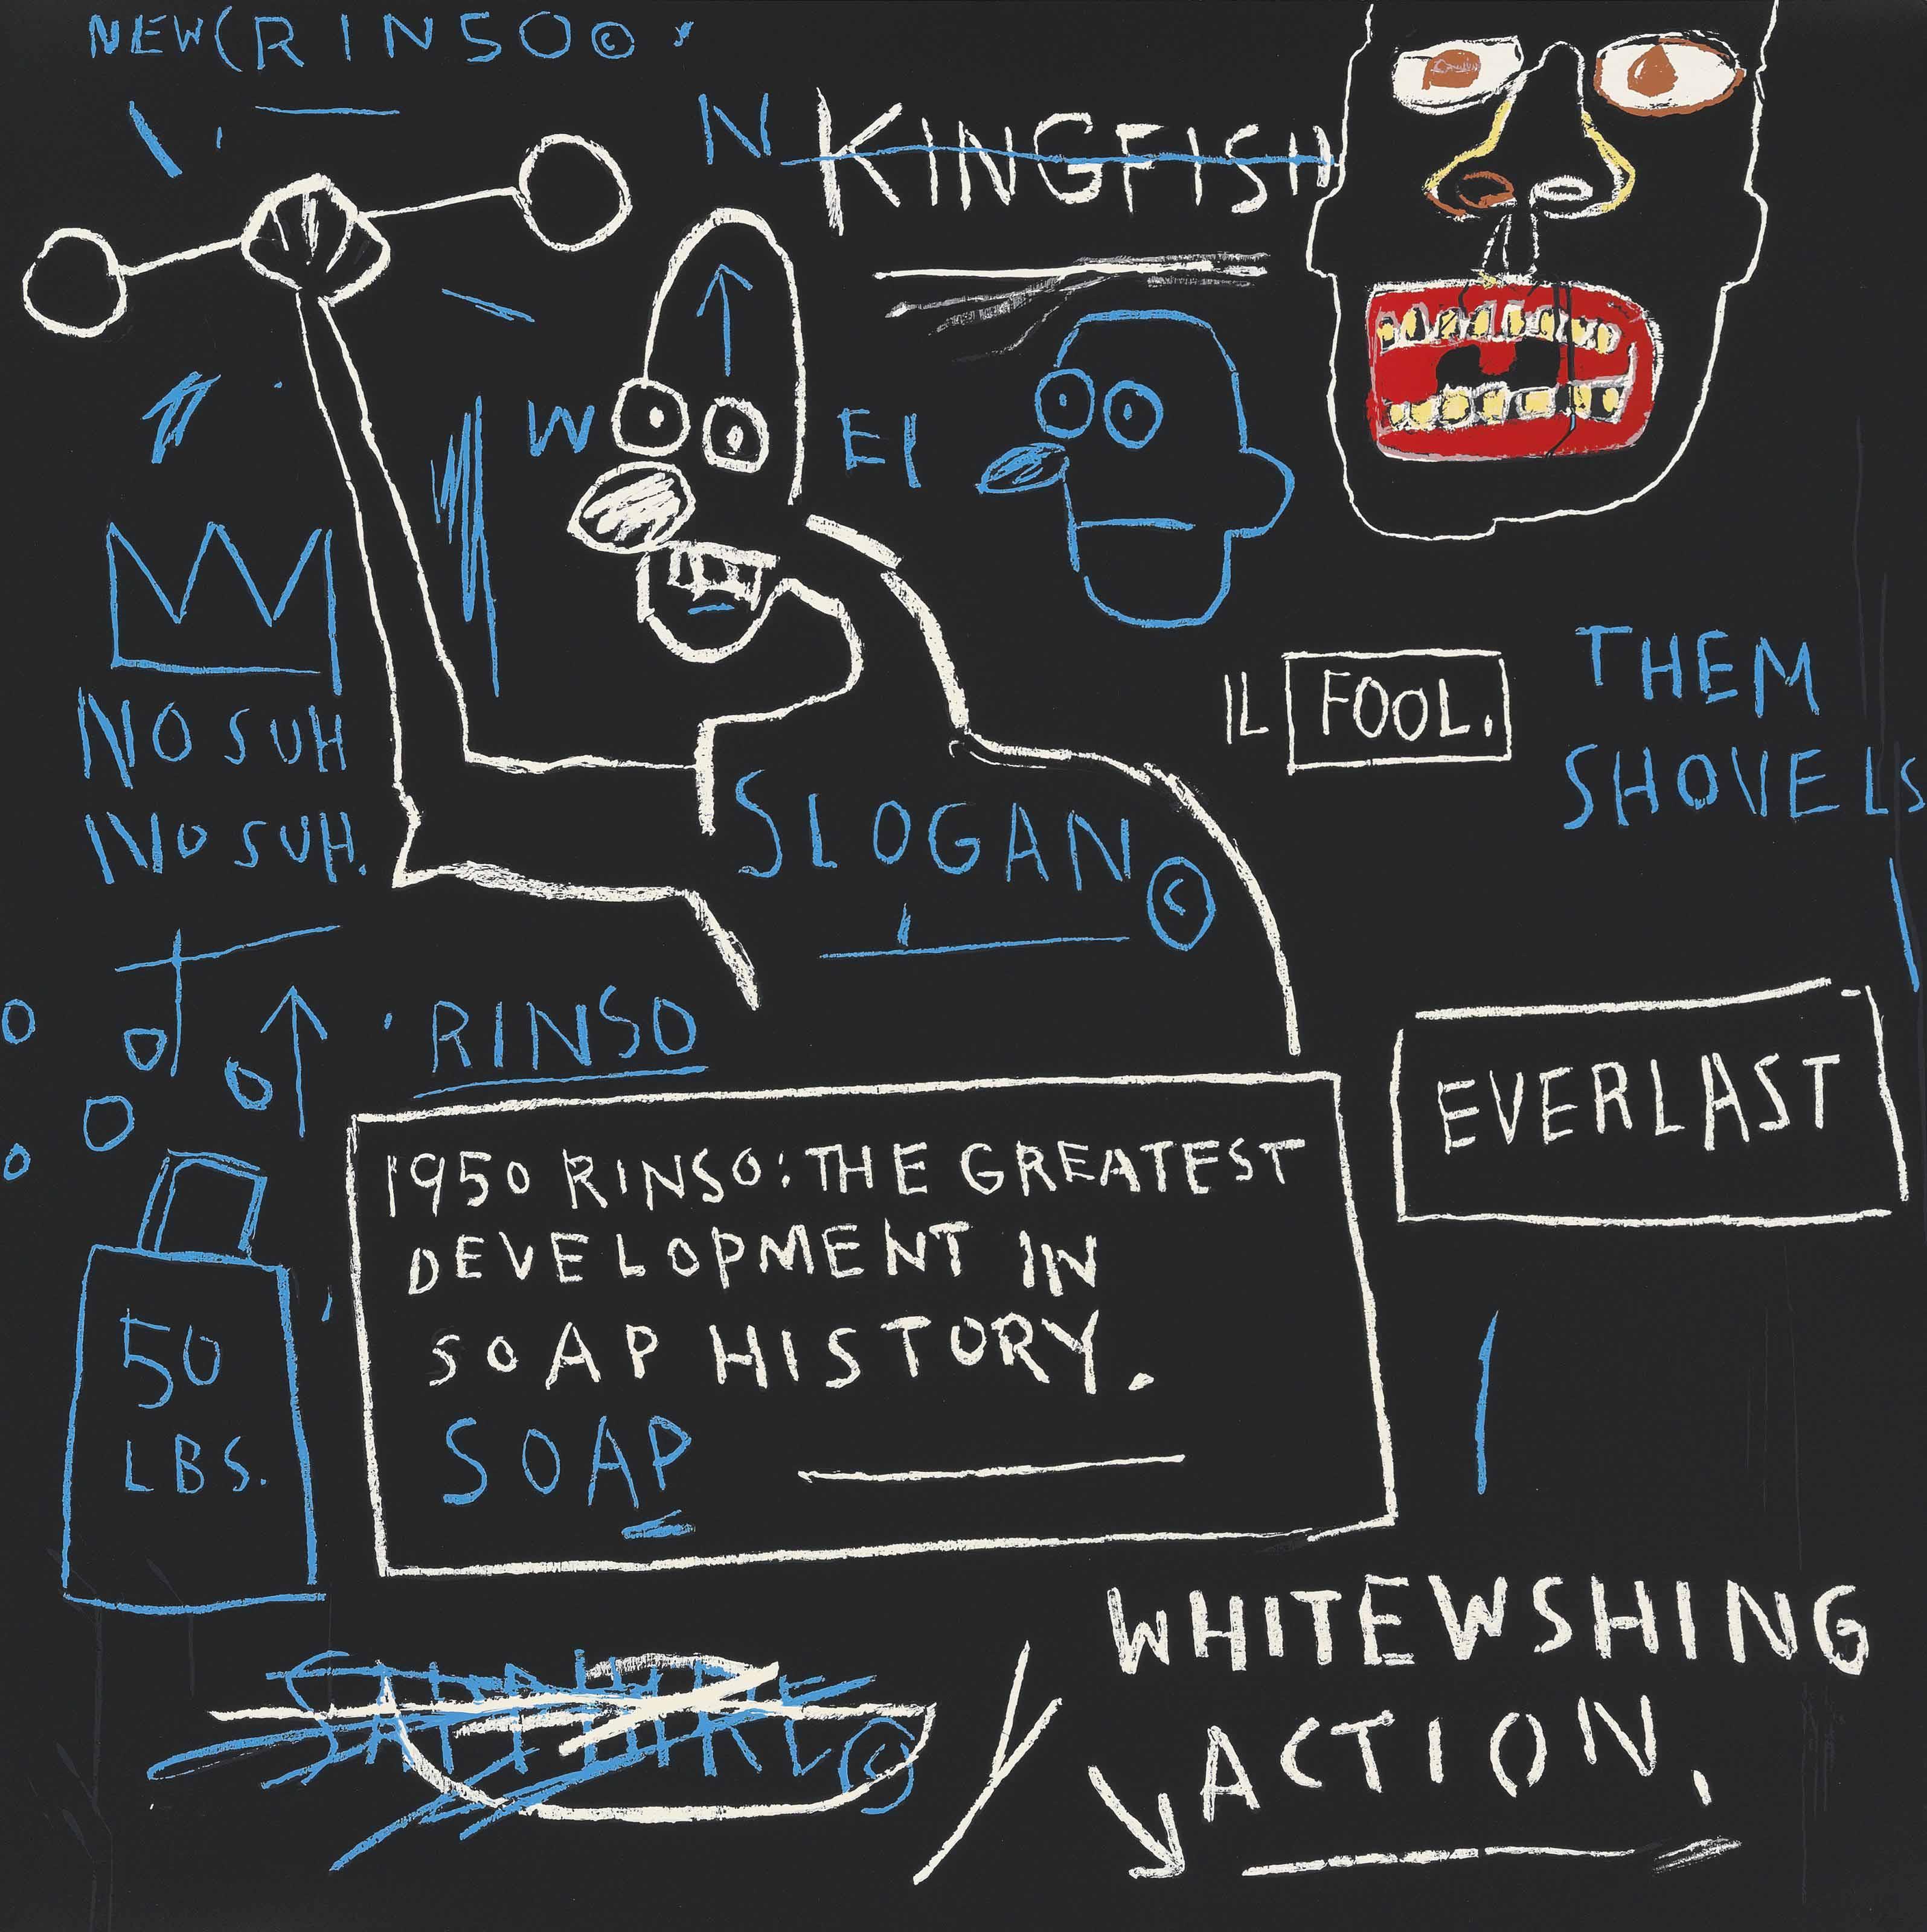 Jean-Michel Basquiat, Rinso, Screen print, 2001, ed 85, 101.6×101.6cm